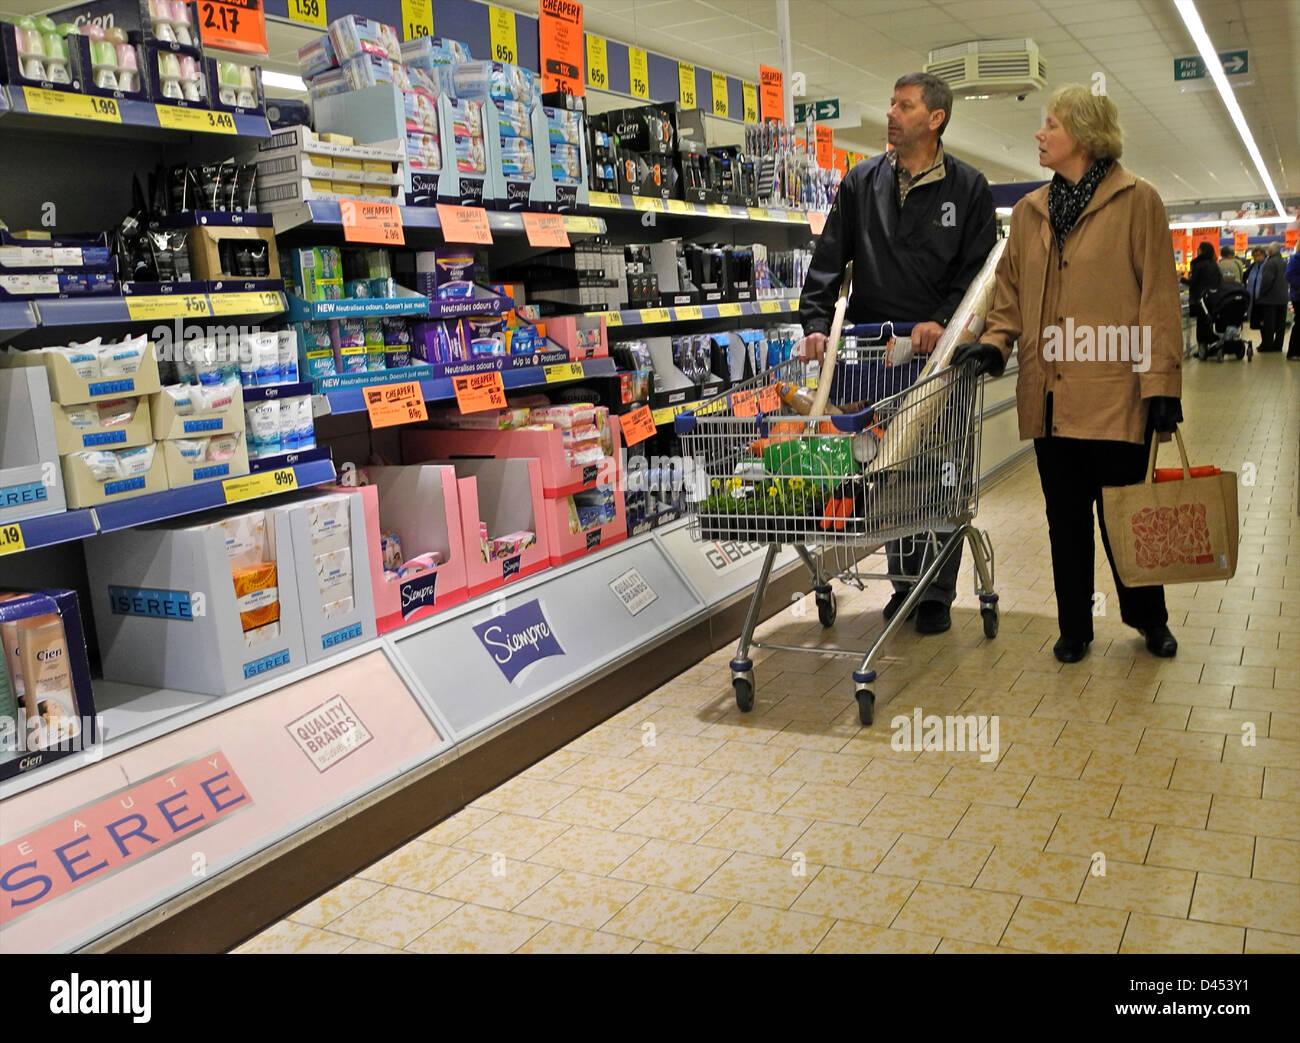 Inside a Lidl store supermarket interior - Stock Image